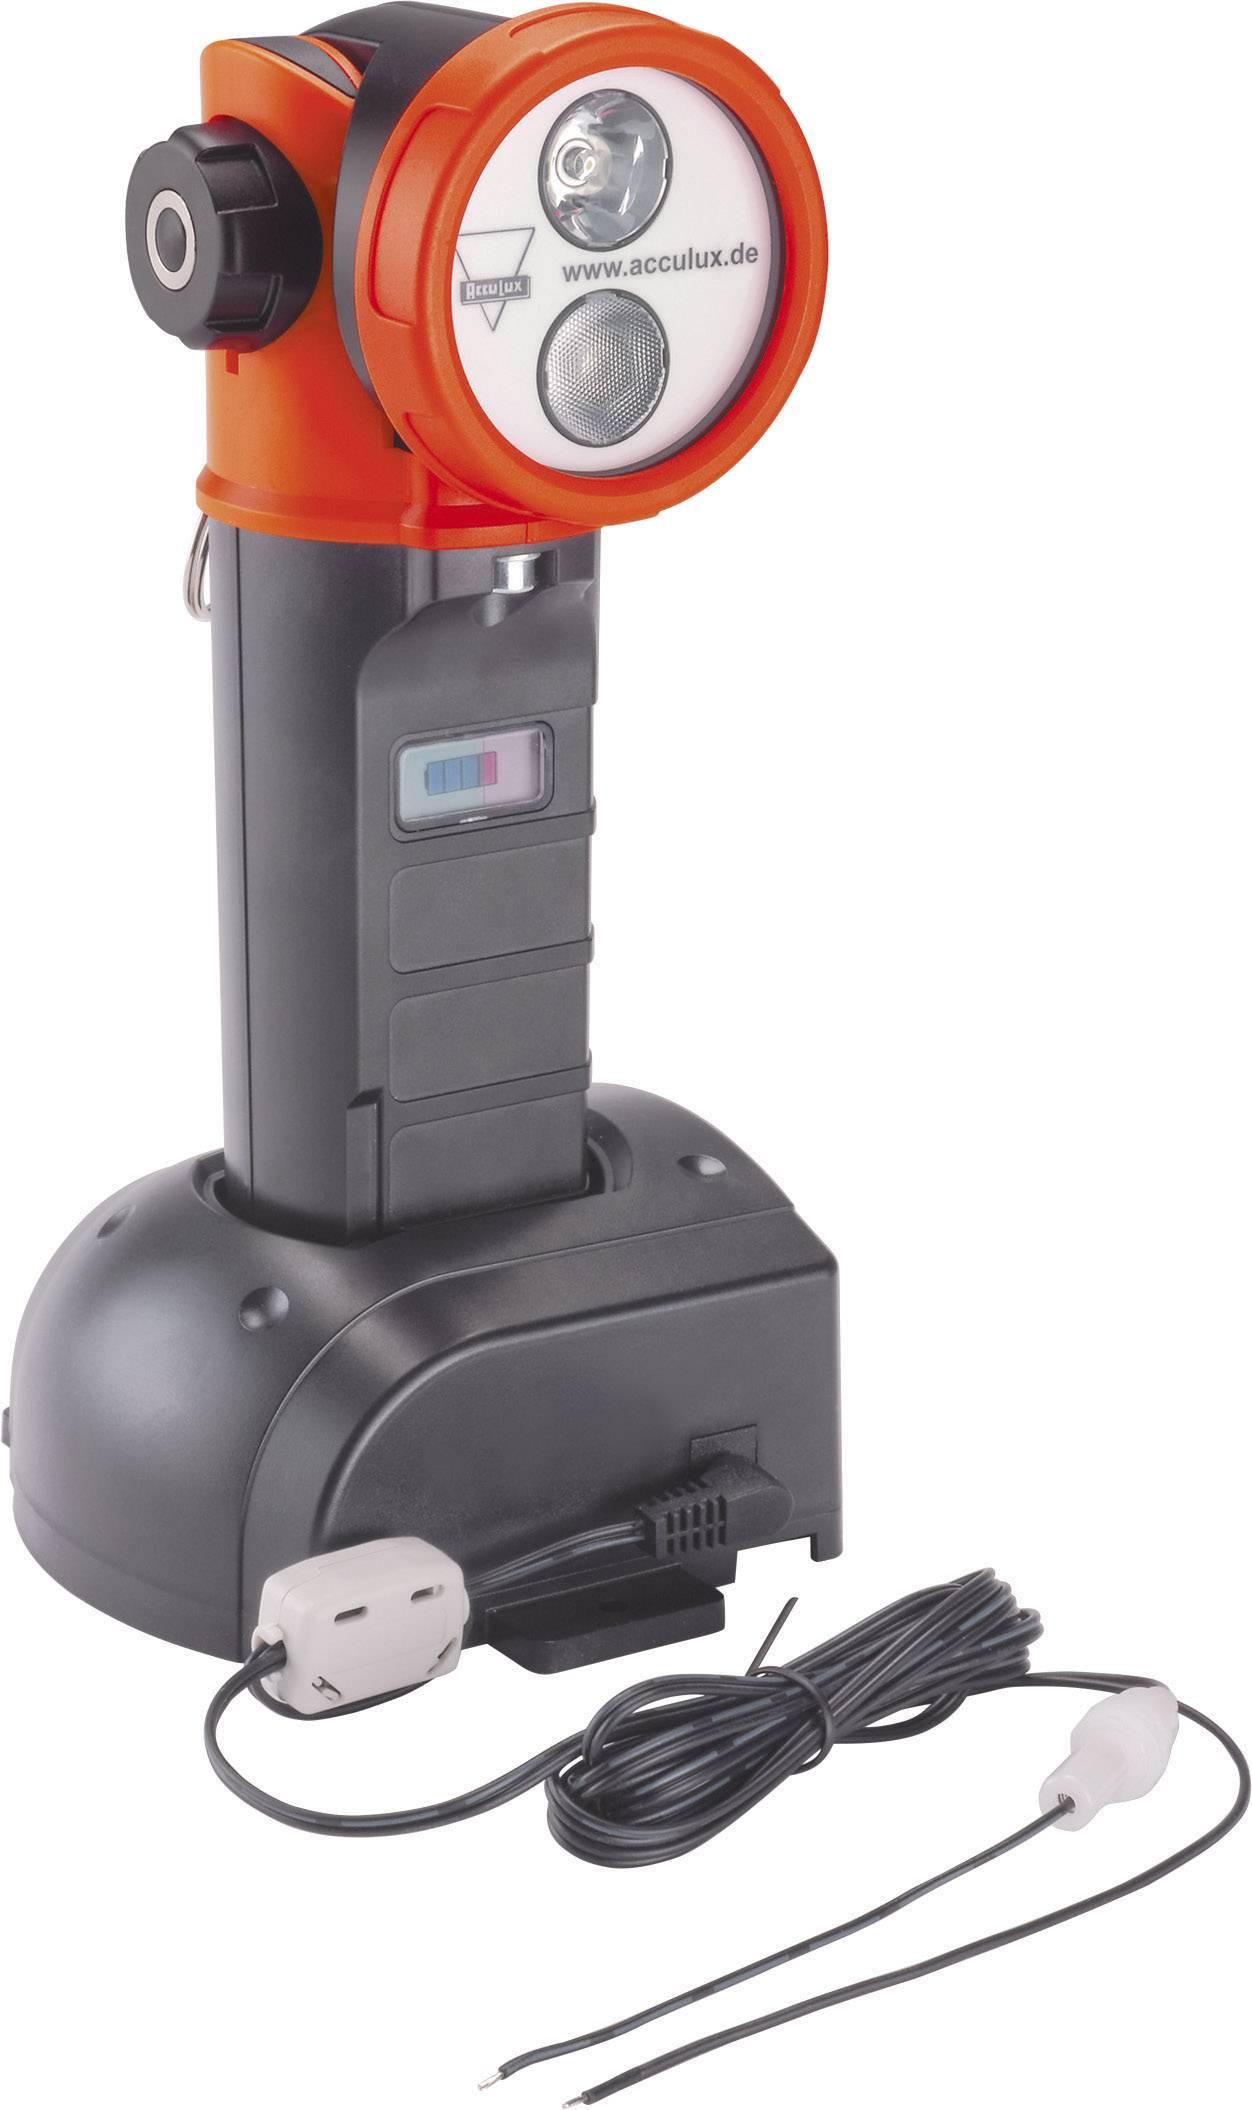 Akumulátorový ruční LED reflektor s otočnou hlavou AccuLux HL25 EX, 458581, IP67